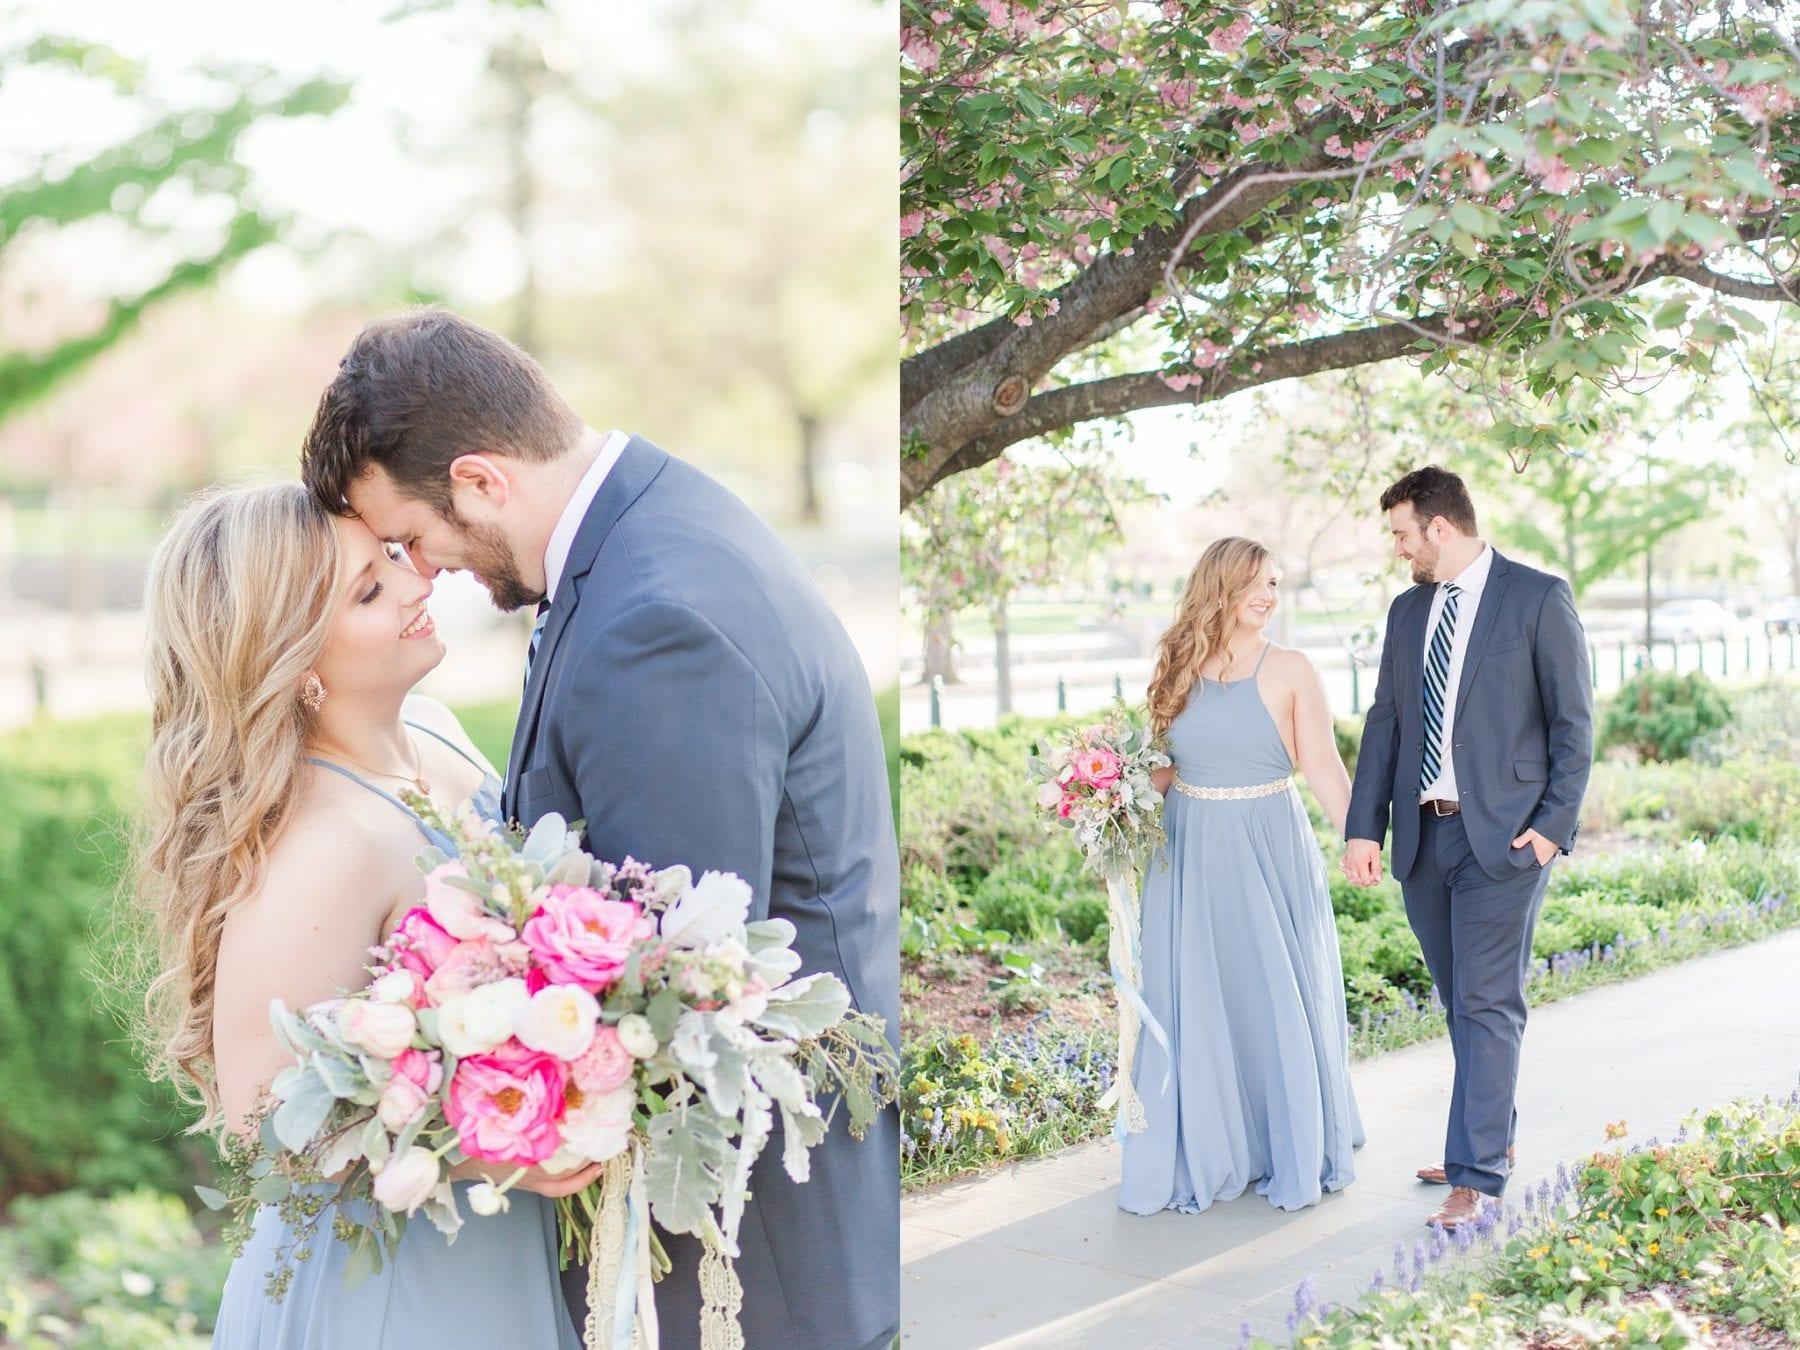 Capitol Hill Engagement Photos Kelly & Zach Washington DC Wedding Photographer Megan Kelsey Photography-37.jpg